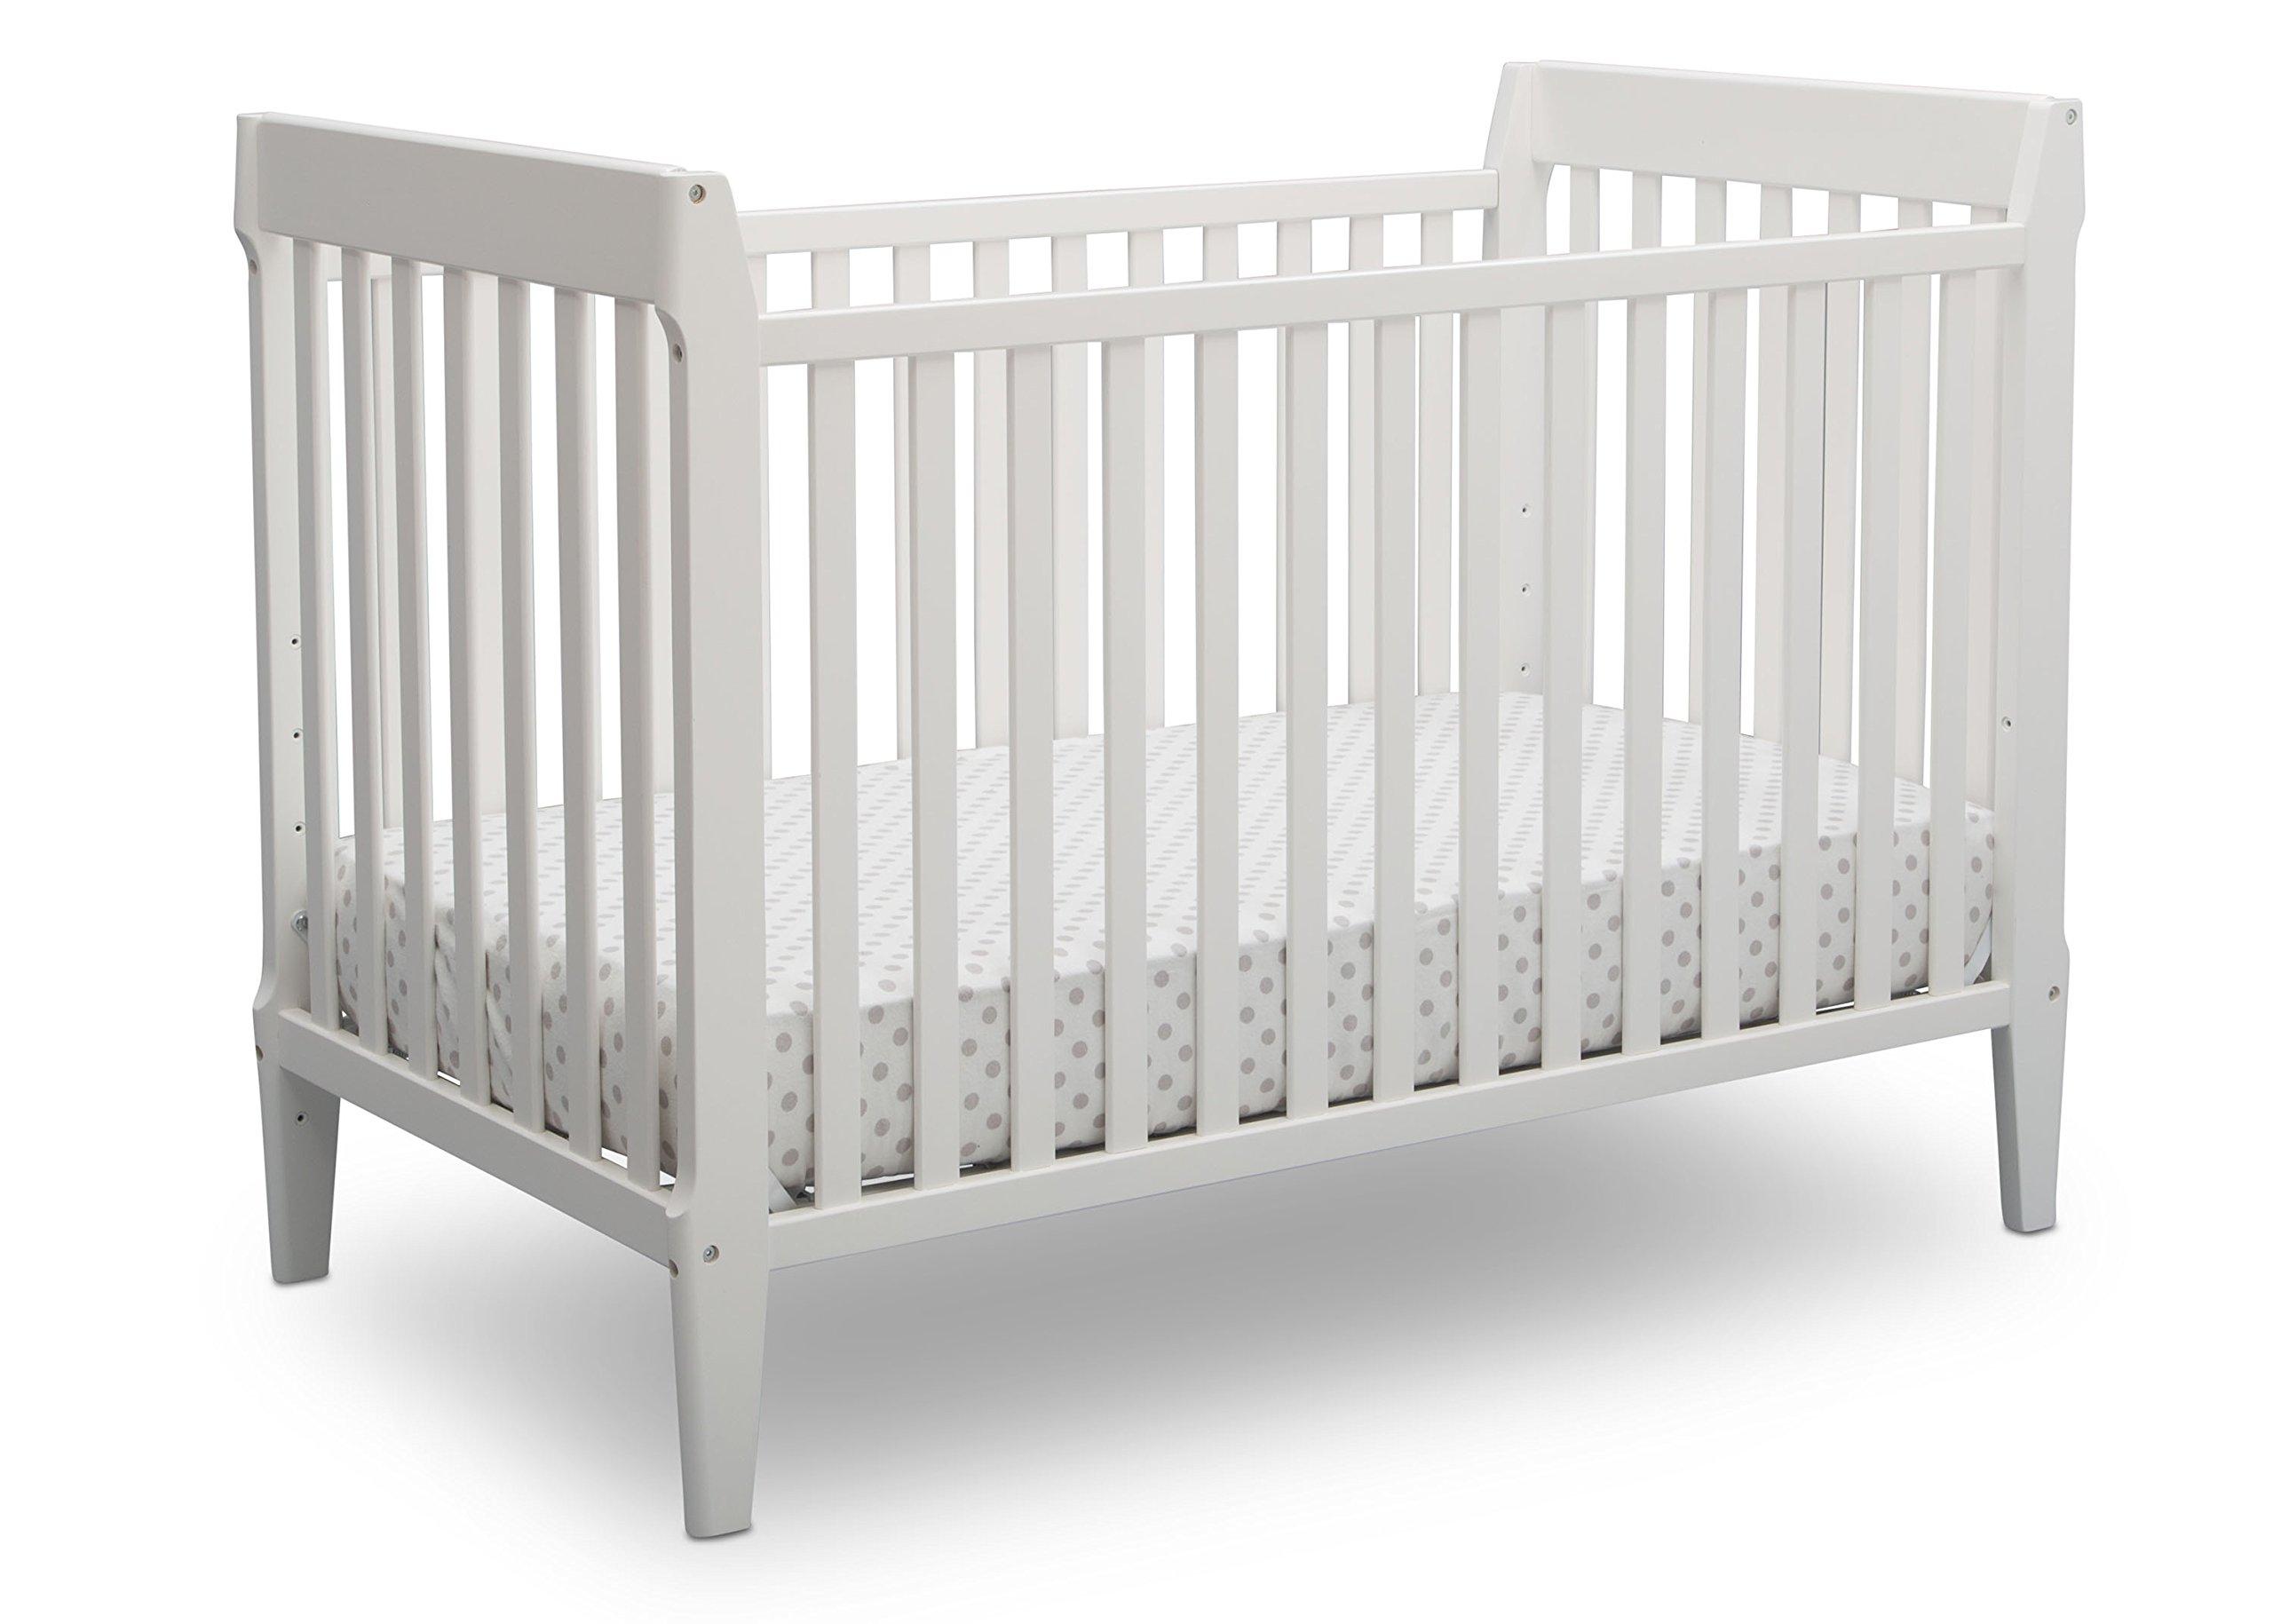 cribs montserrat century crib mid design choosing modern for tips new home